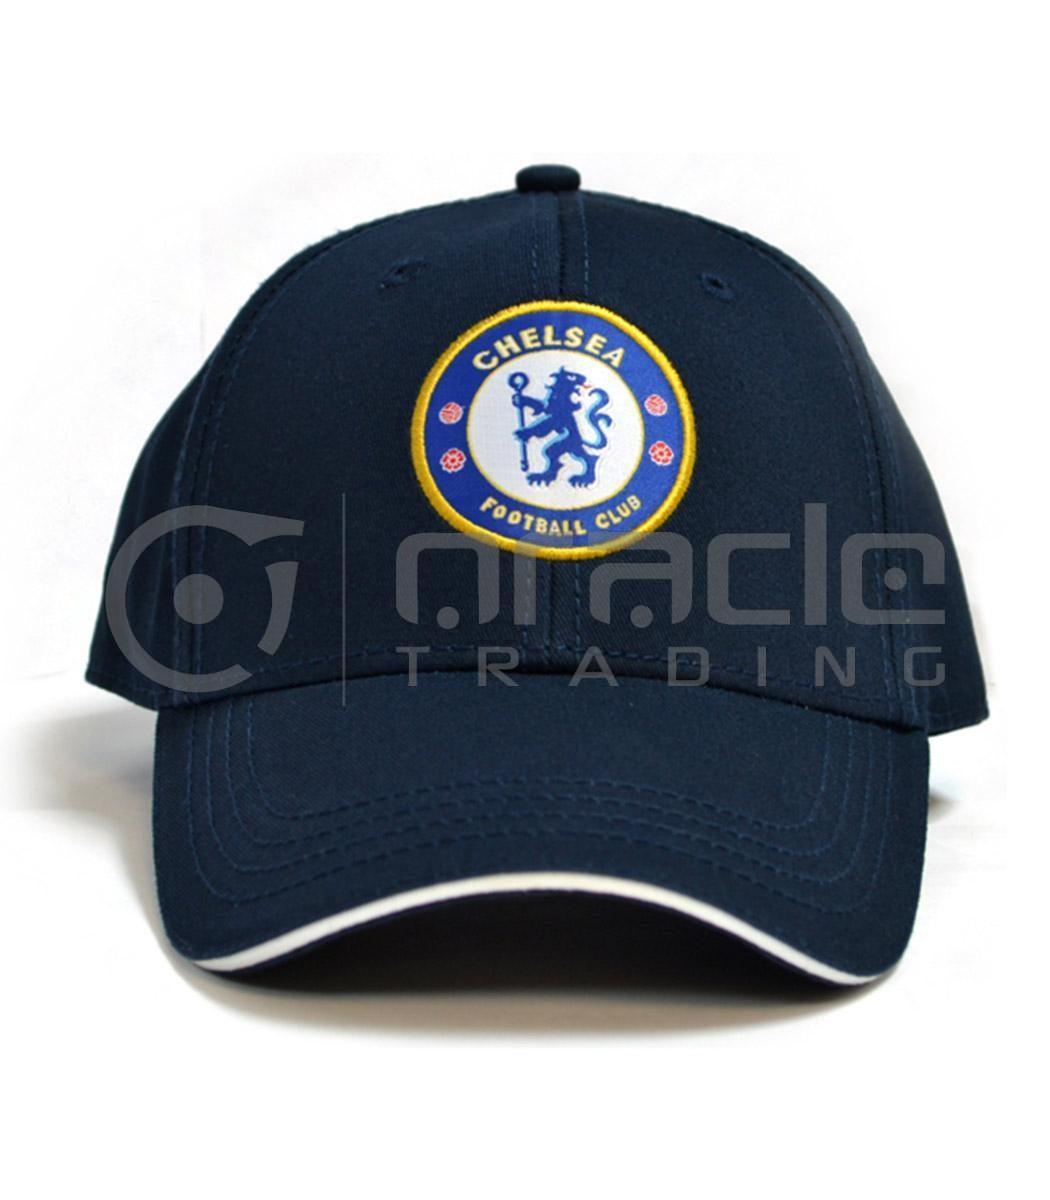 Chelsea Navy Crest Hat